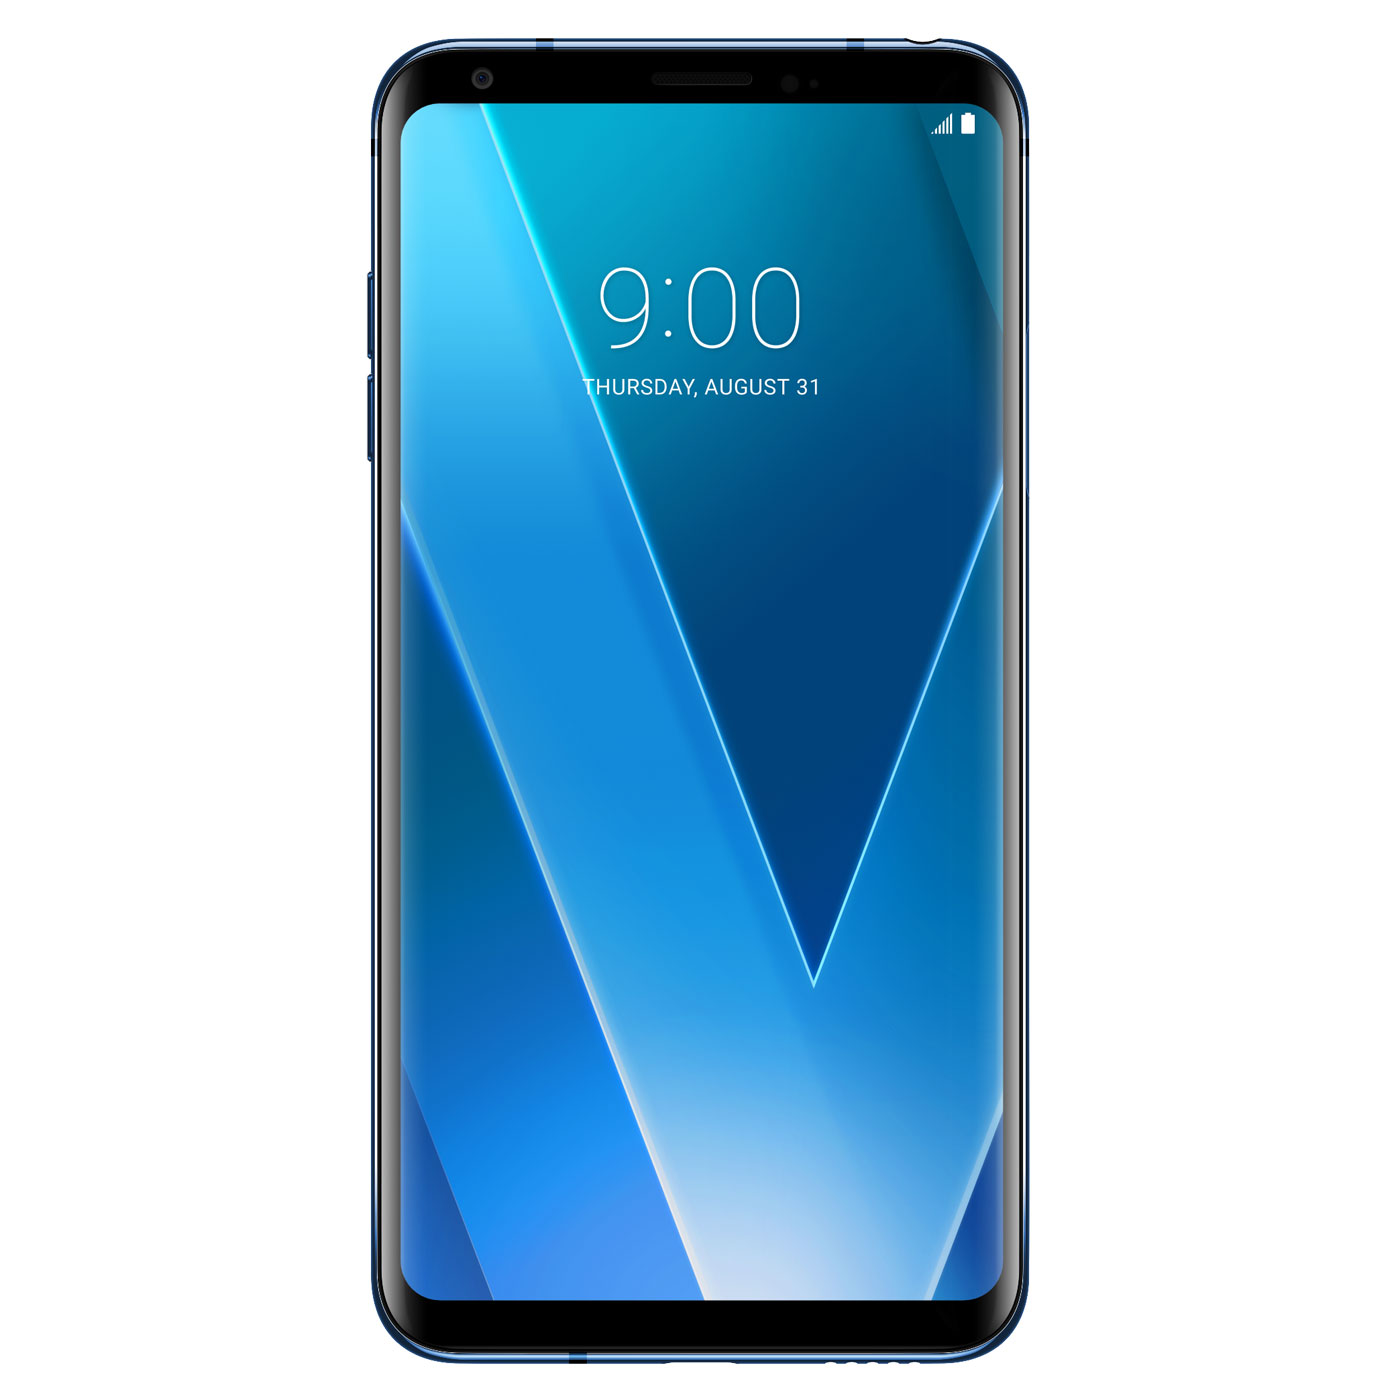 "Mobile & smartphone LG V30 Bleu Smartphone 4G-LTE IP68 - Snapdragon 835 8-Core 2.45 GHz - RAM 4 Go - Ecran tactile 6"" OLED 1440 x 2880 - 64 Go - NFC/Bluetooth 5.0 - 3300 mAh - Android 7.1.2"